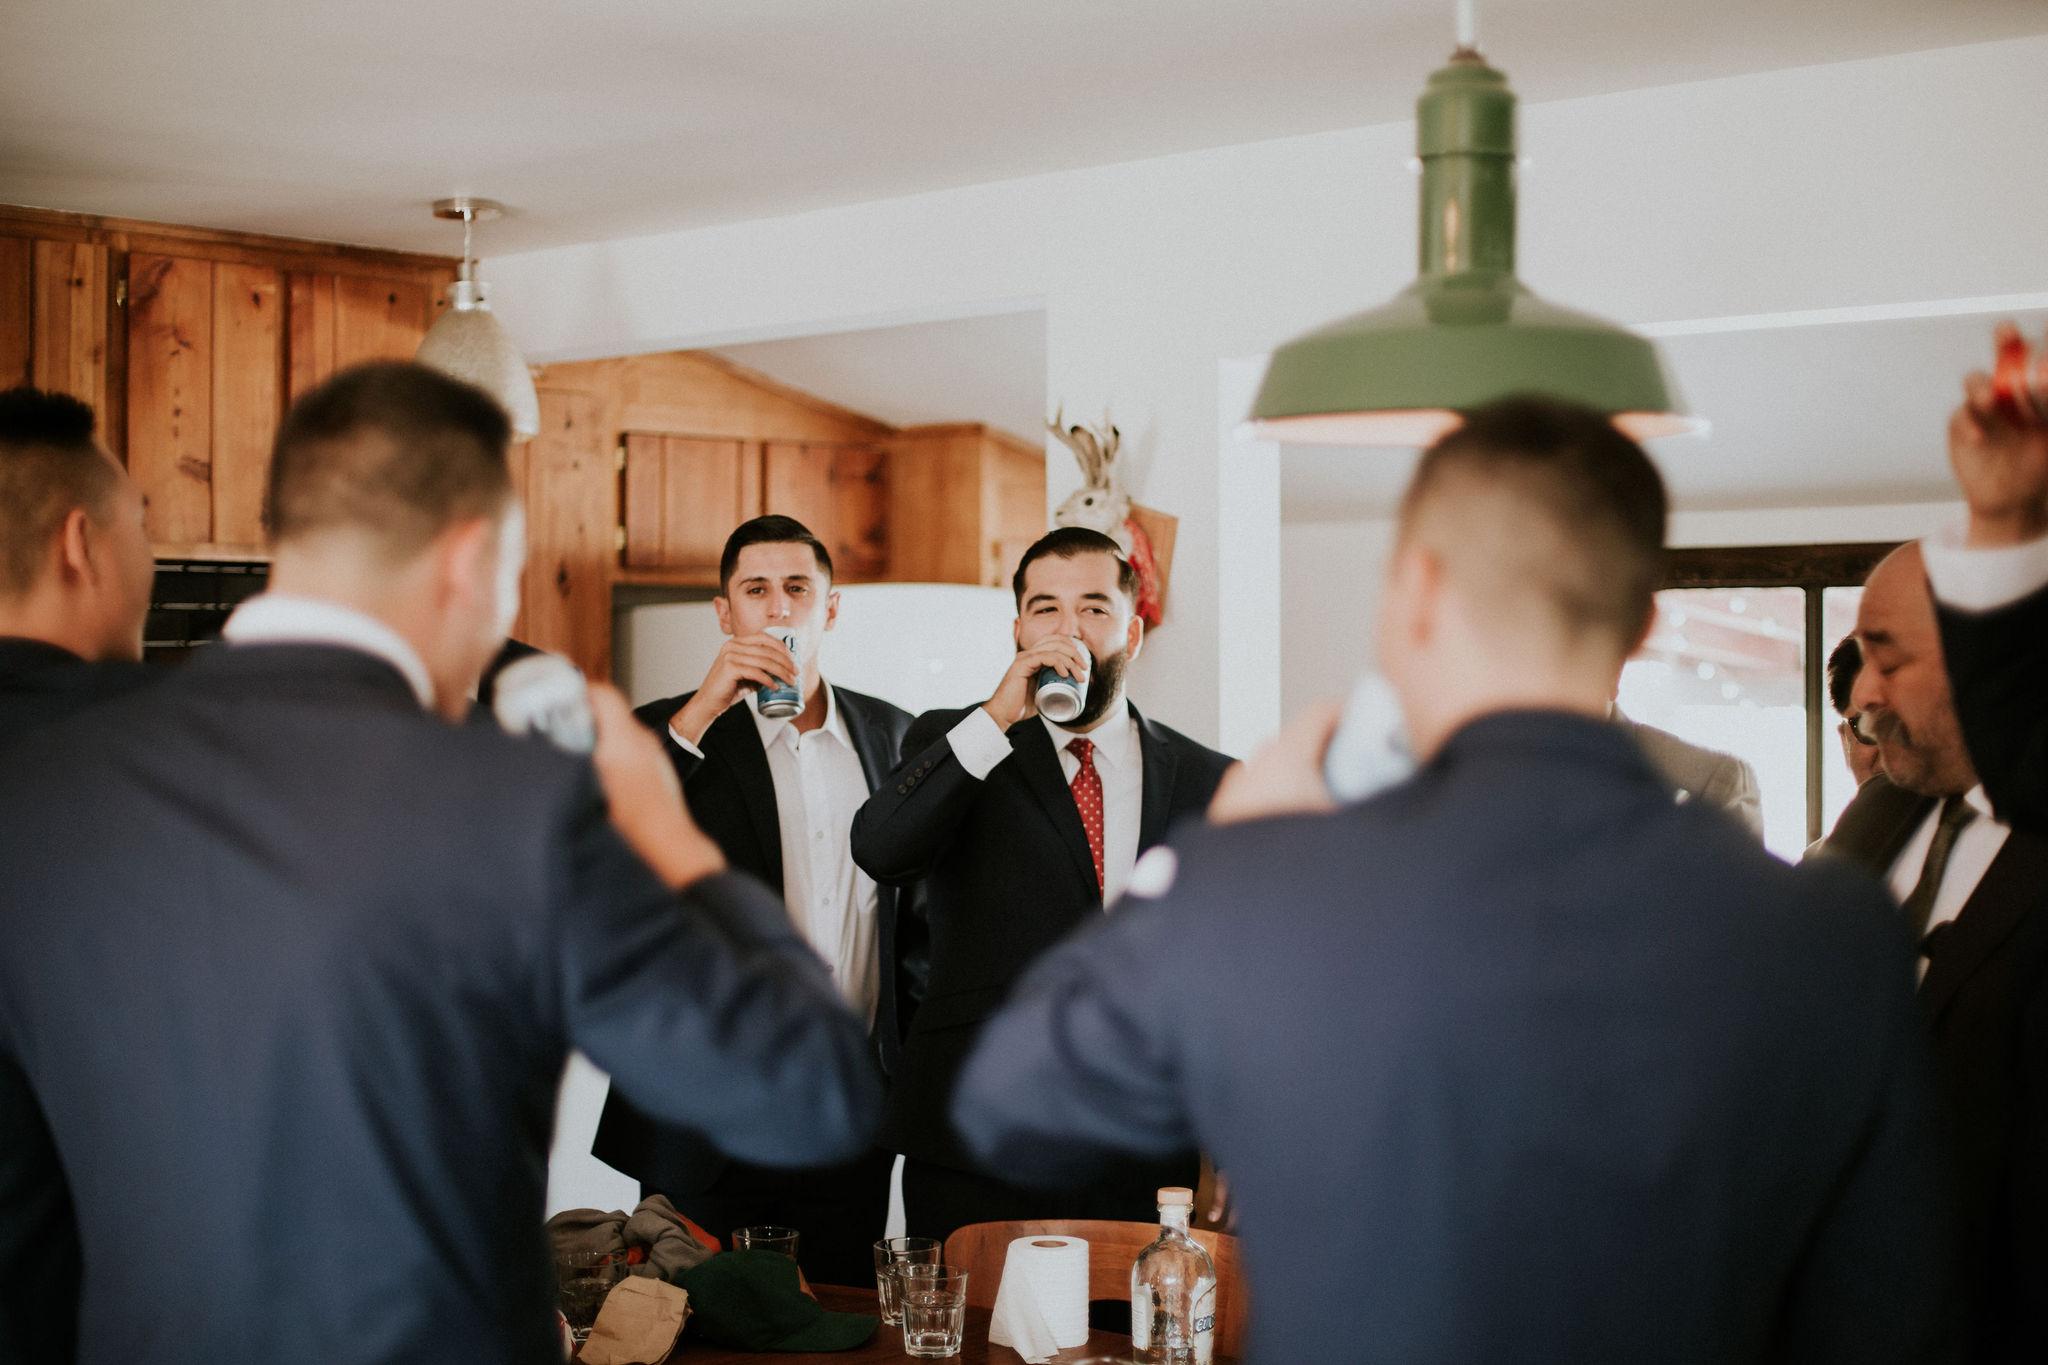 RimrockRanch-JoshuaTree-Wedding-Jami-Laree-135.jpg